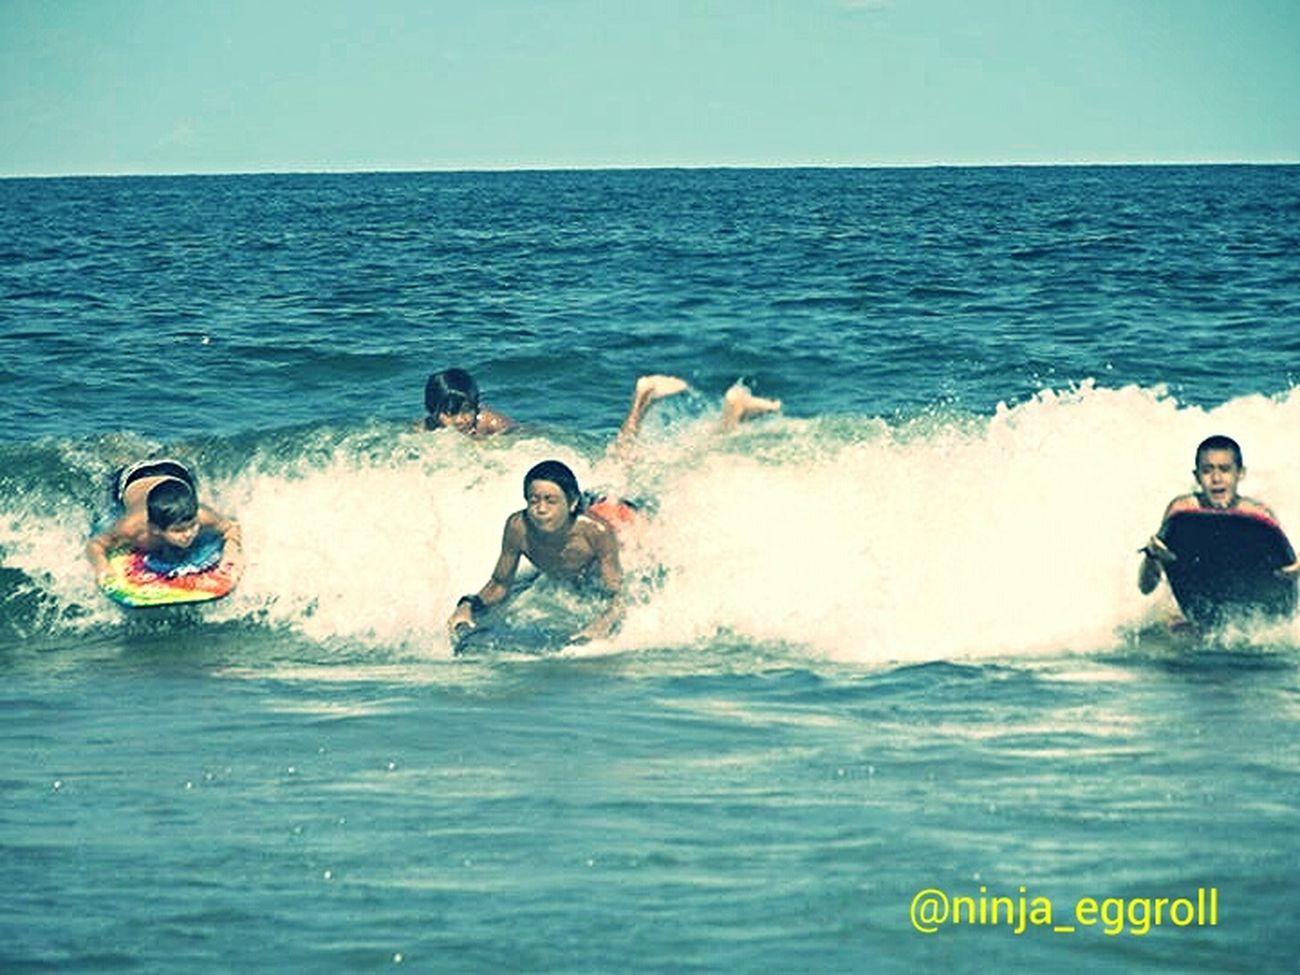 my nephews At The Beach body surfing Enjoying Summer Catching Waves